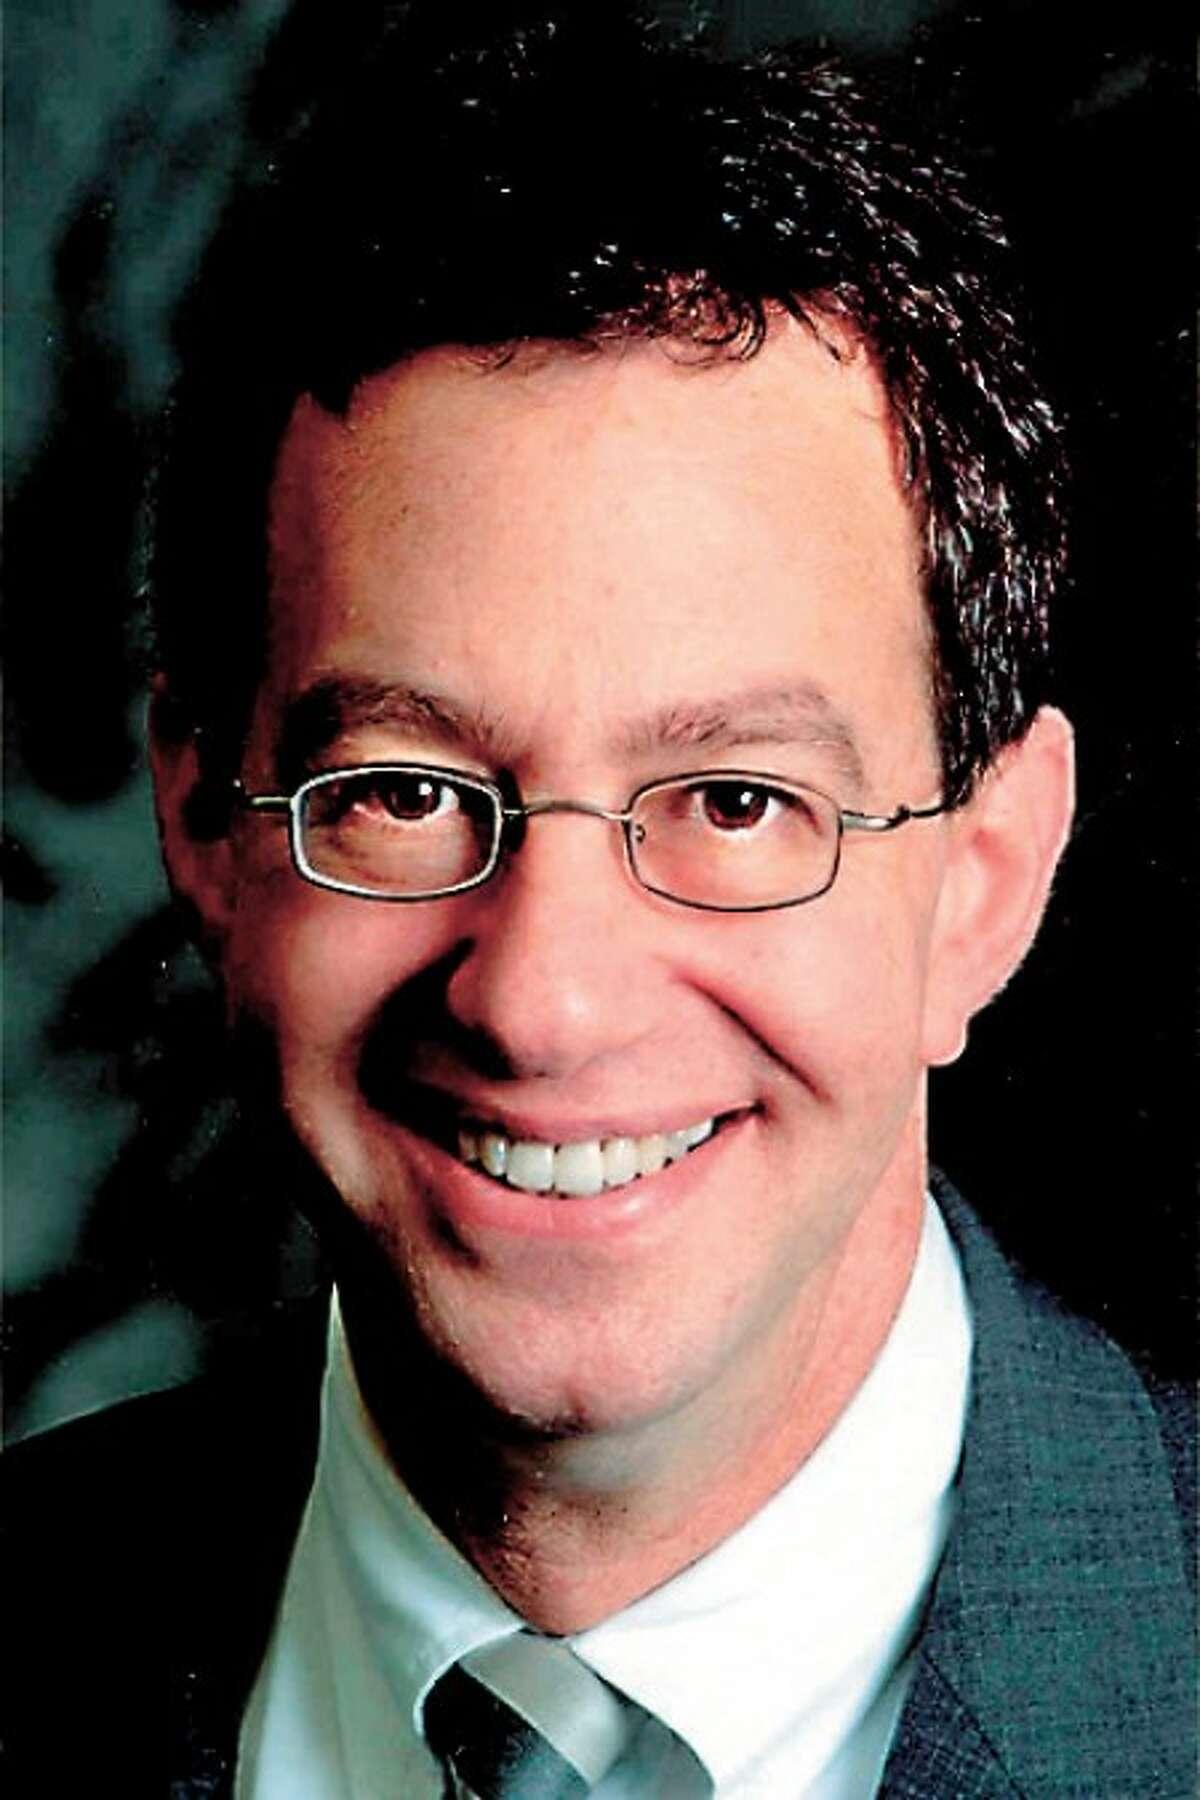 CEO of Norwalk Hospital resigns